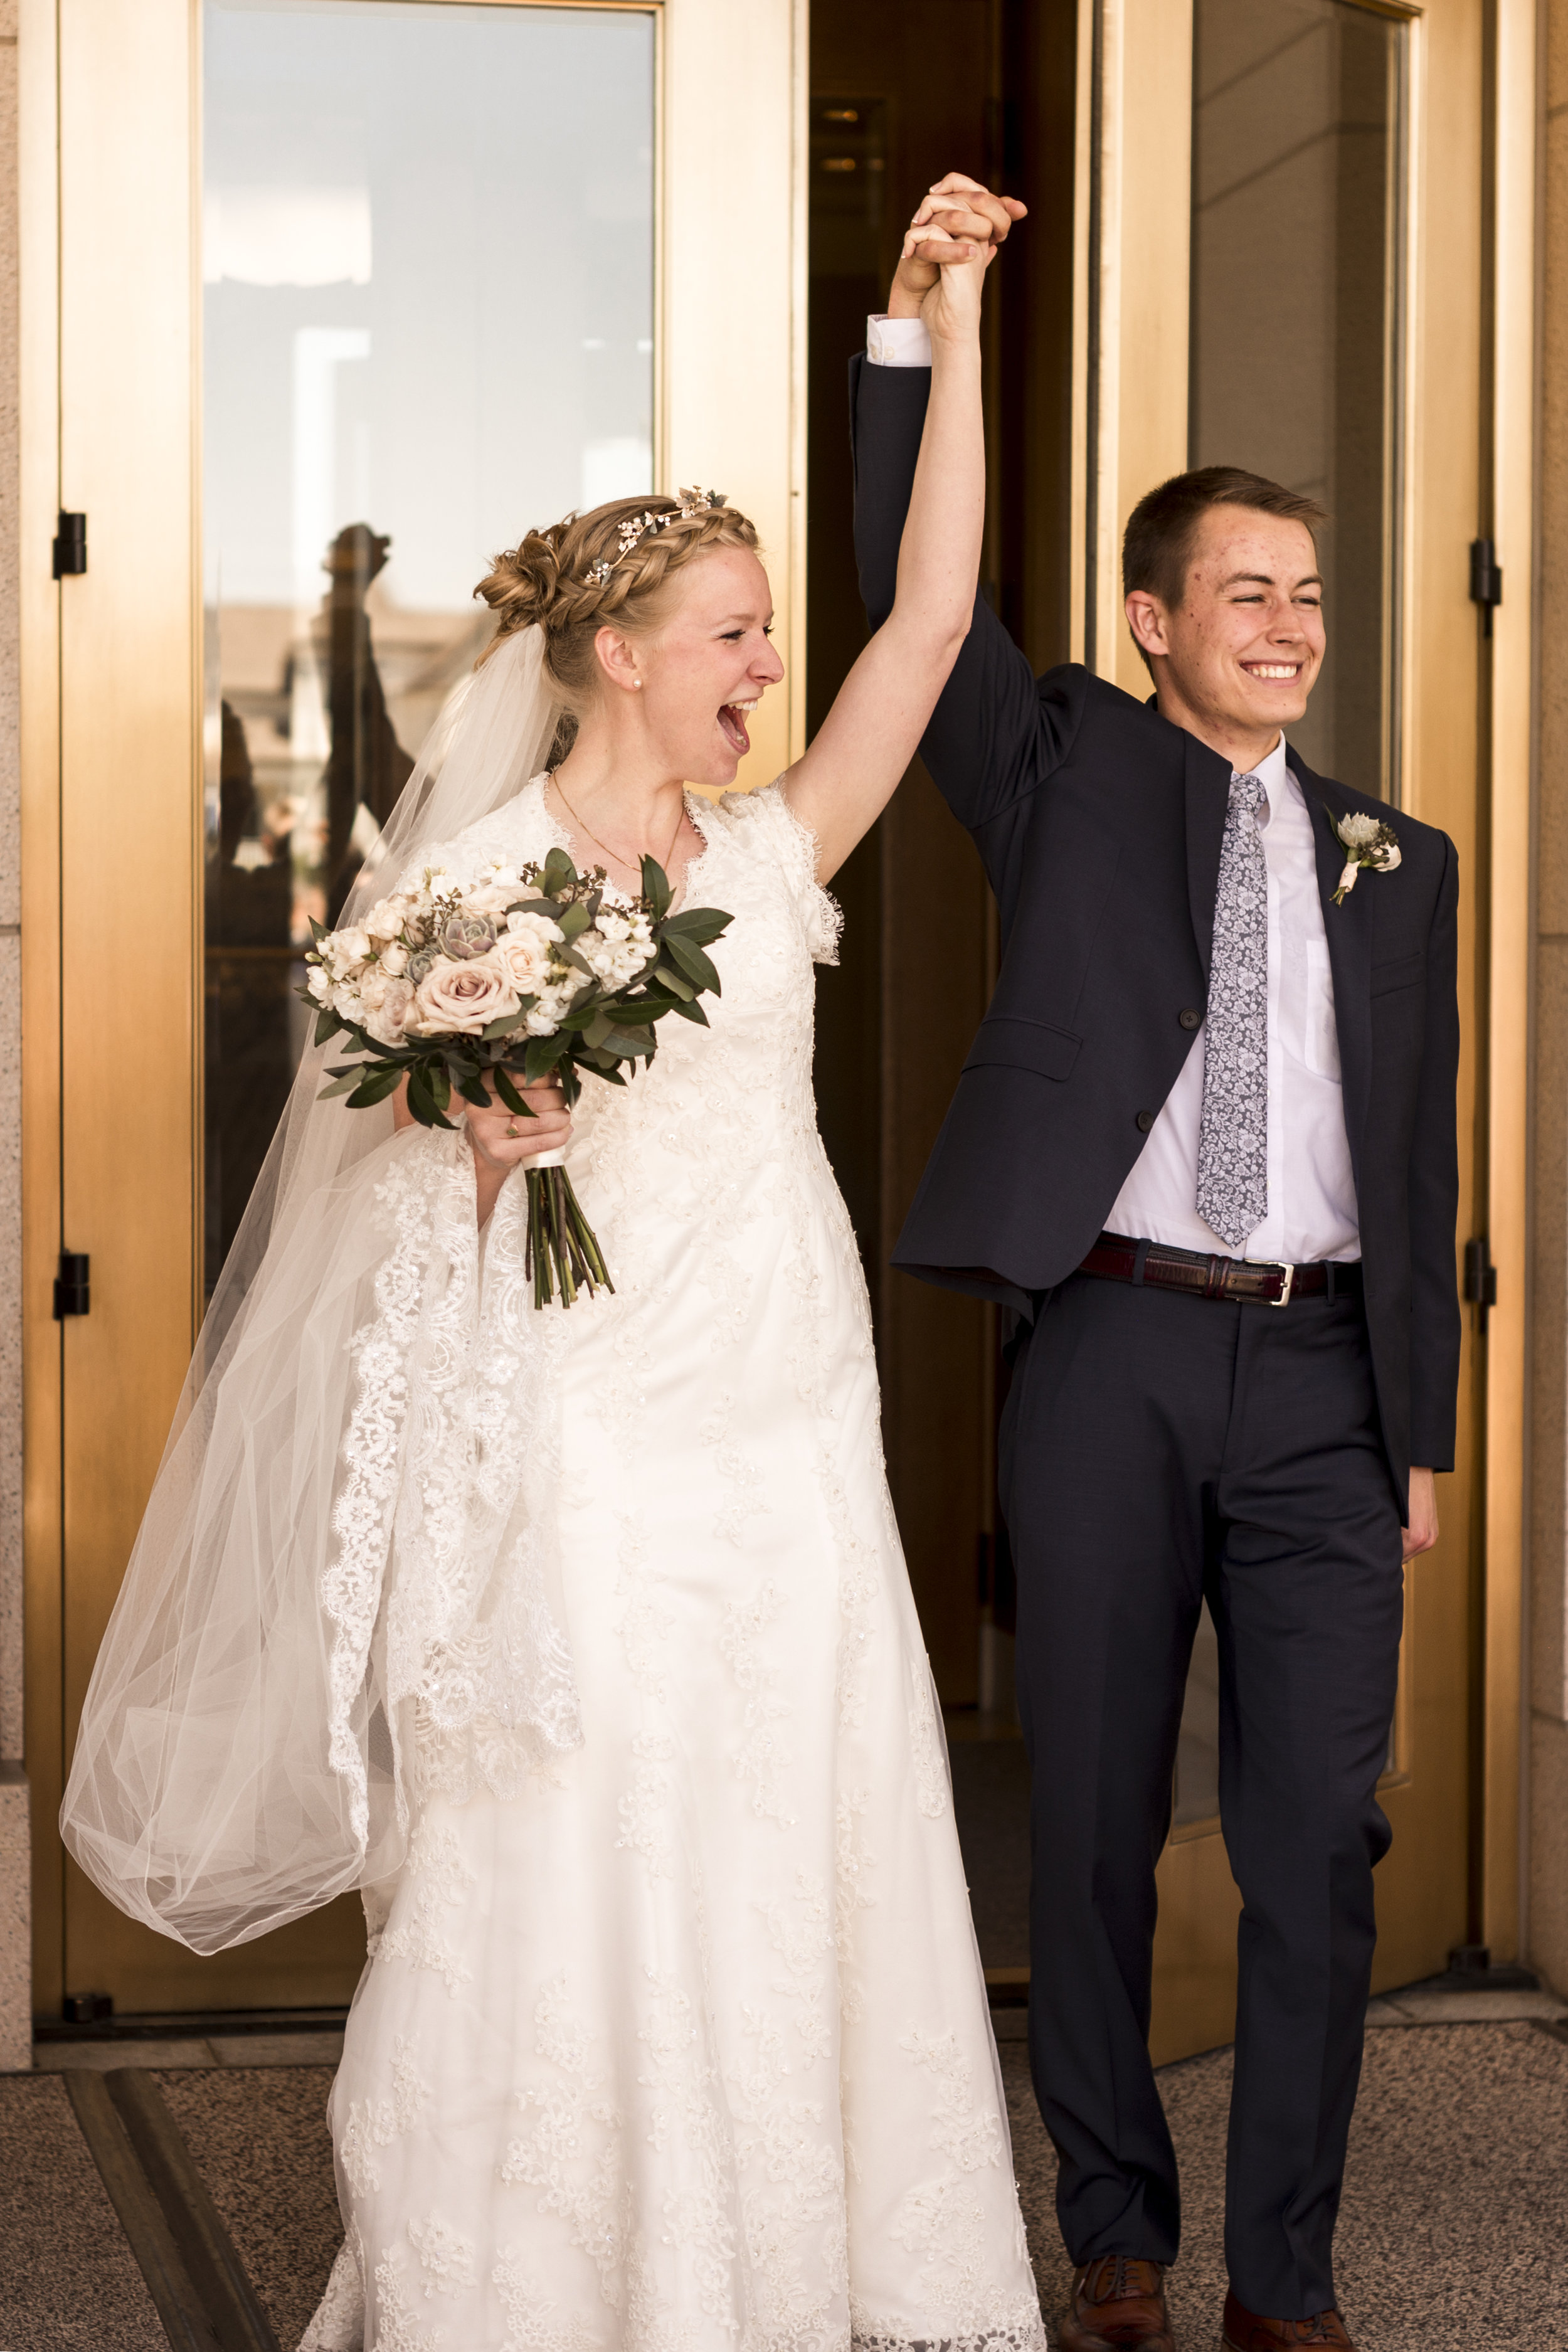 LDS Summer Wedding | South Jordan, Utah Wedding Photographer| Bri Bergman Photography 02.JPG